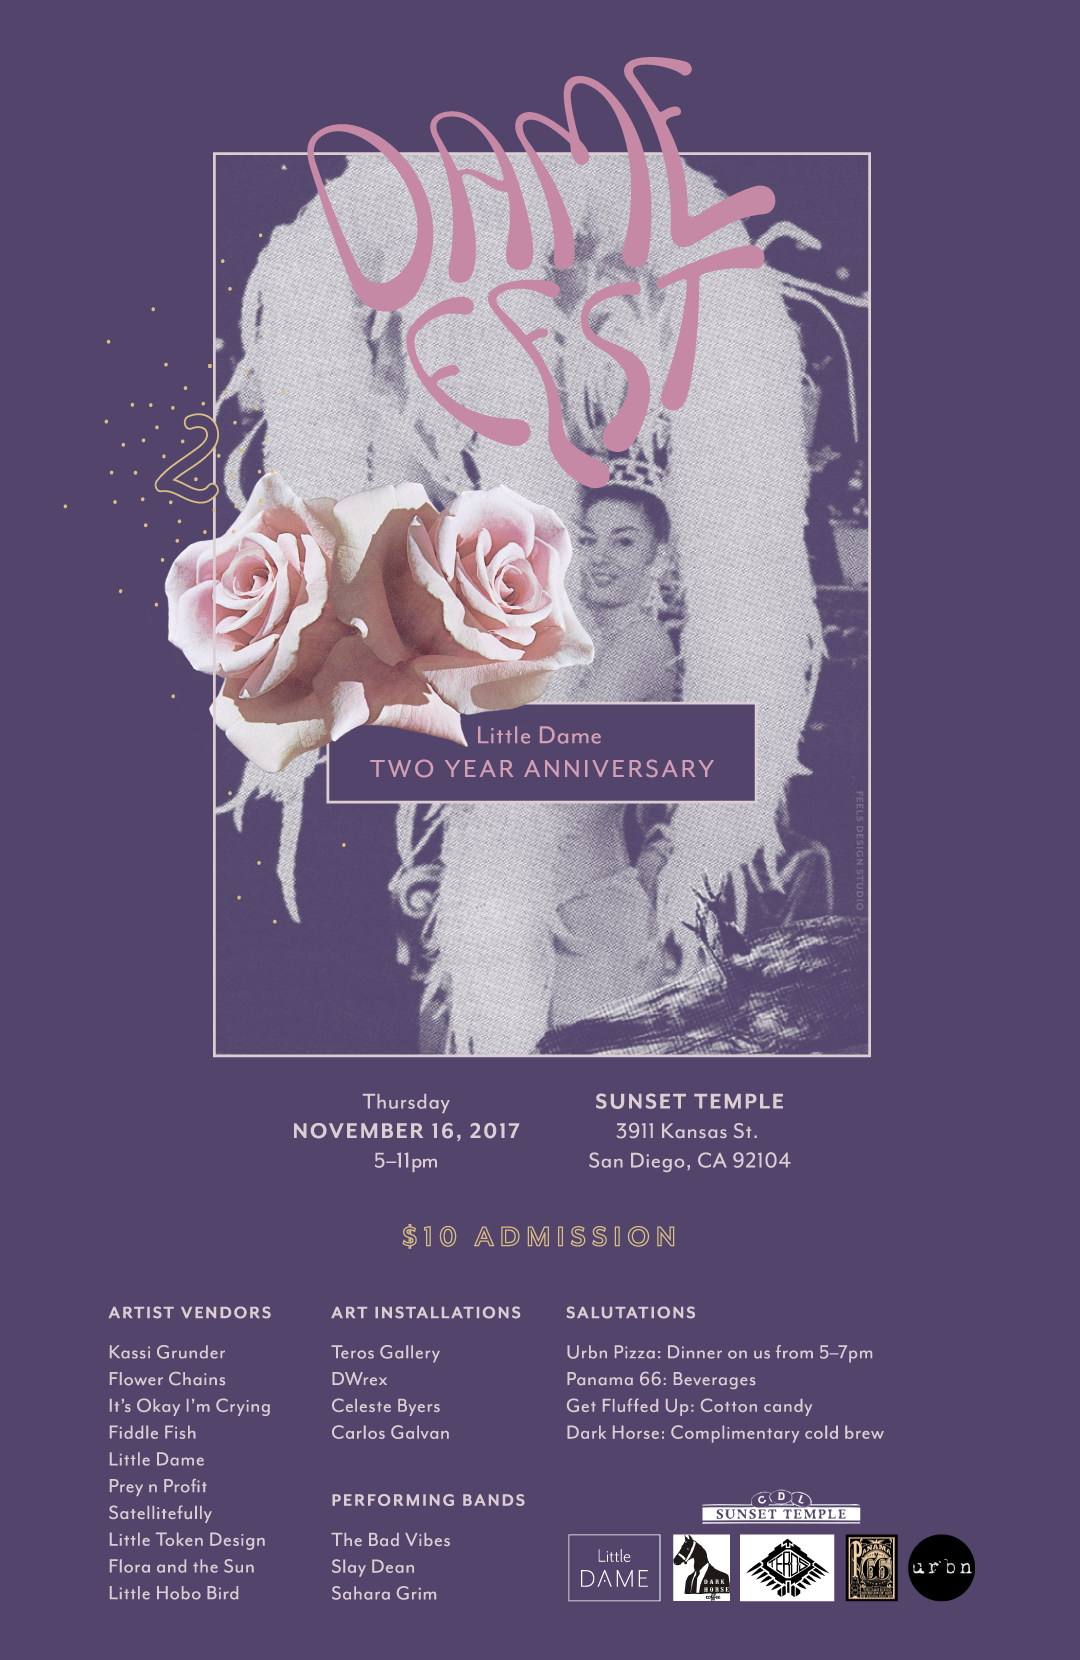 Little Dame | Dame Fest 2 | Print Poster